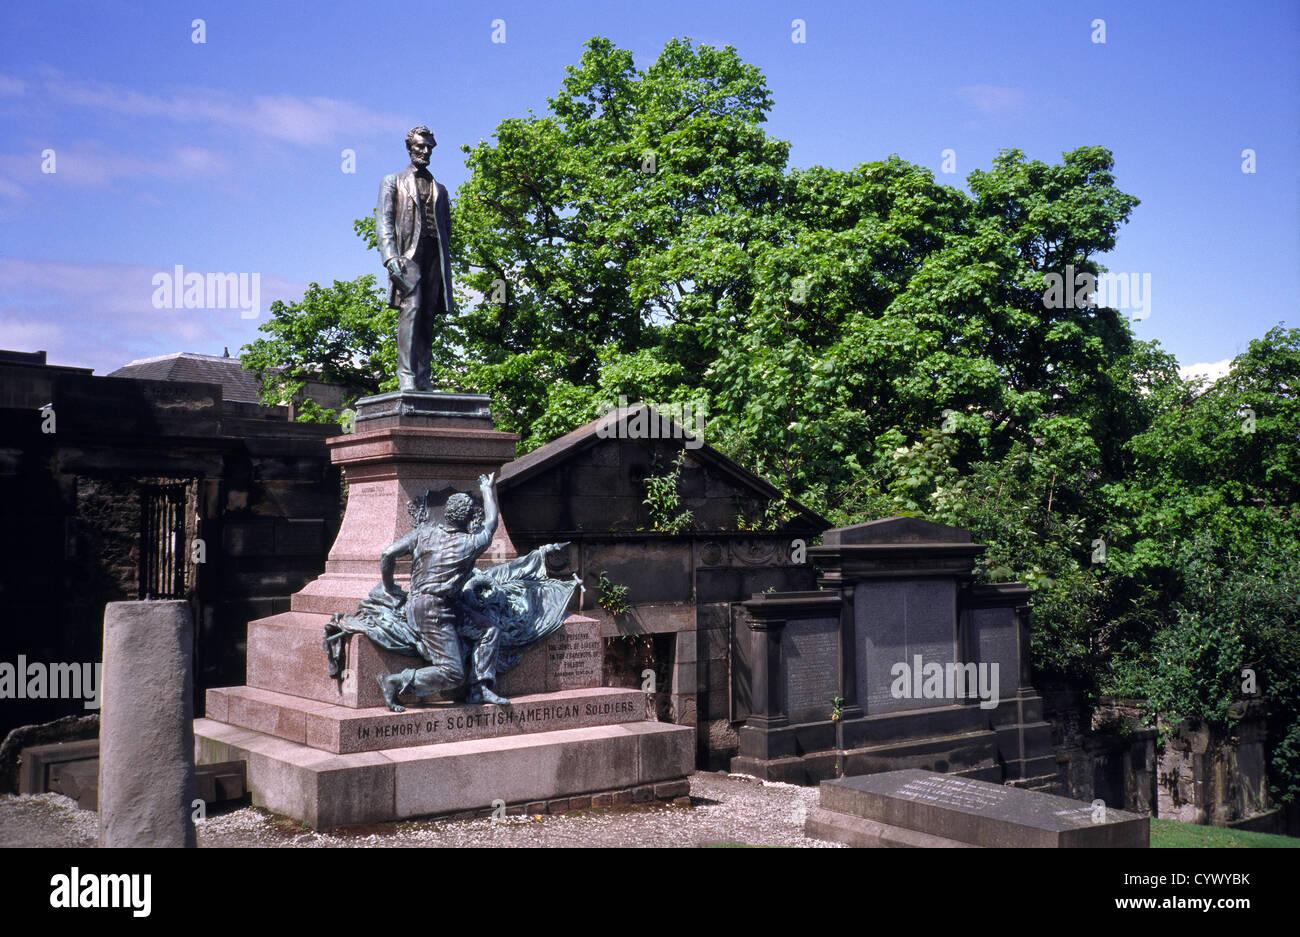 American Civil War Memorial or Scottish-American Soldiers Monument, Old Calton Burial Ground, Edinburgh, Scotland, Stock Photo